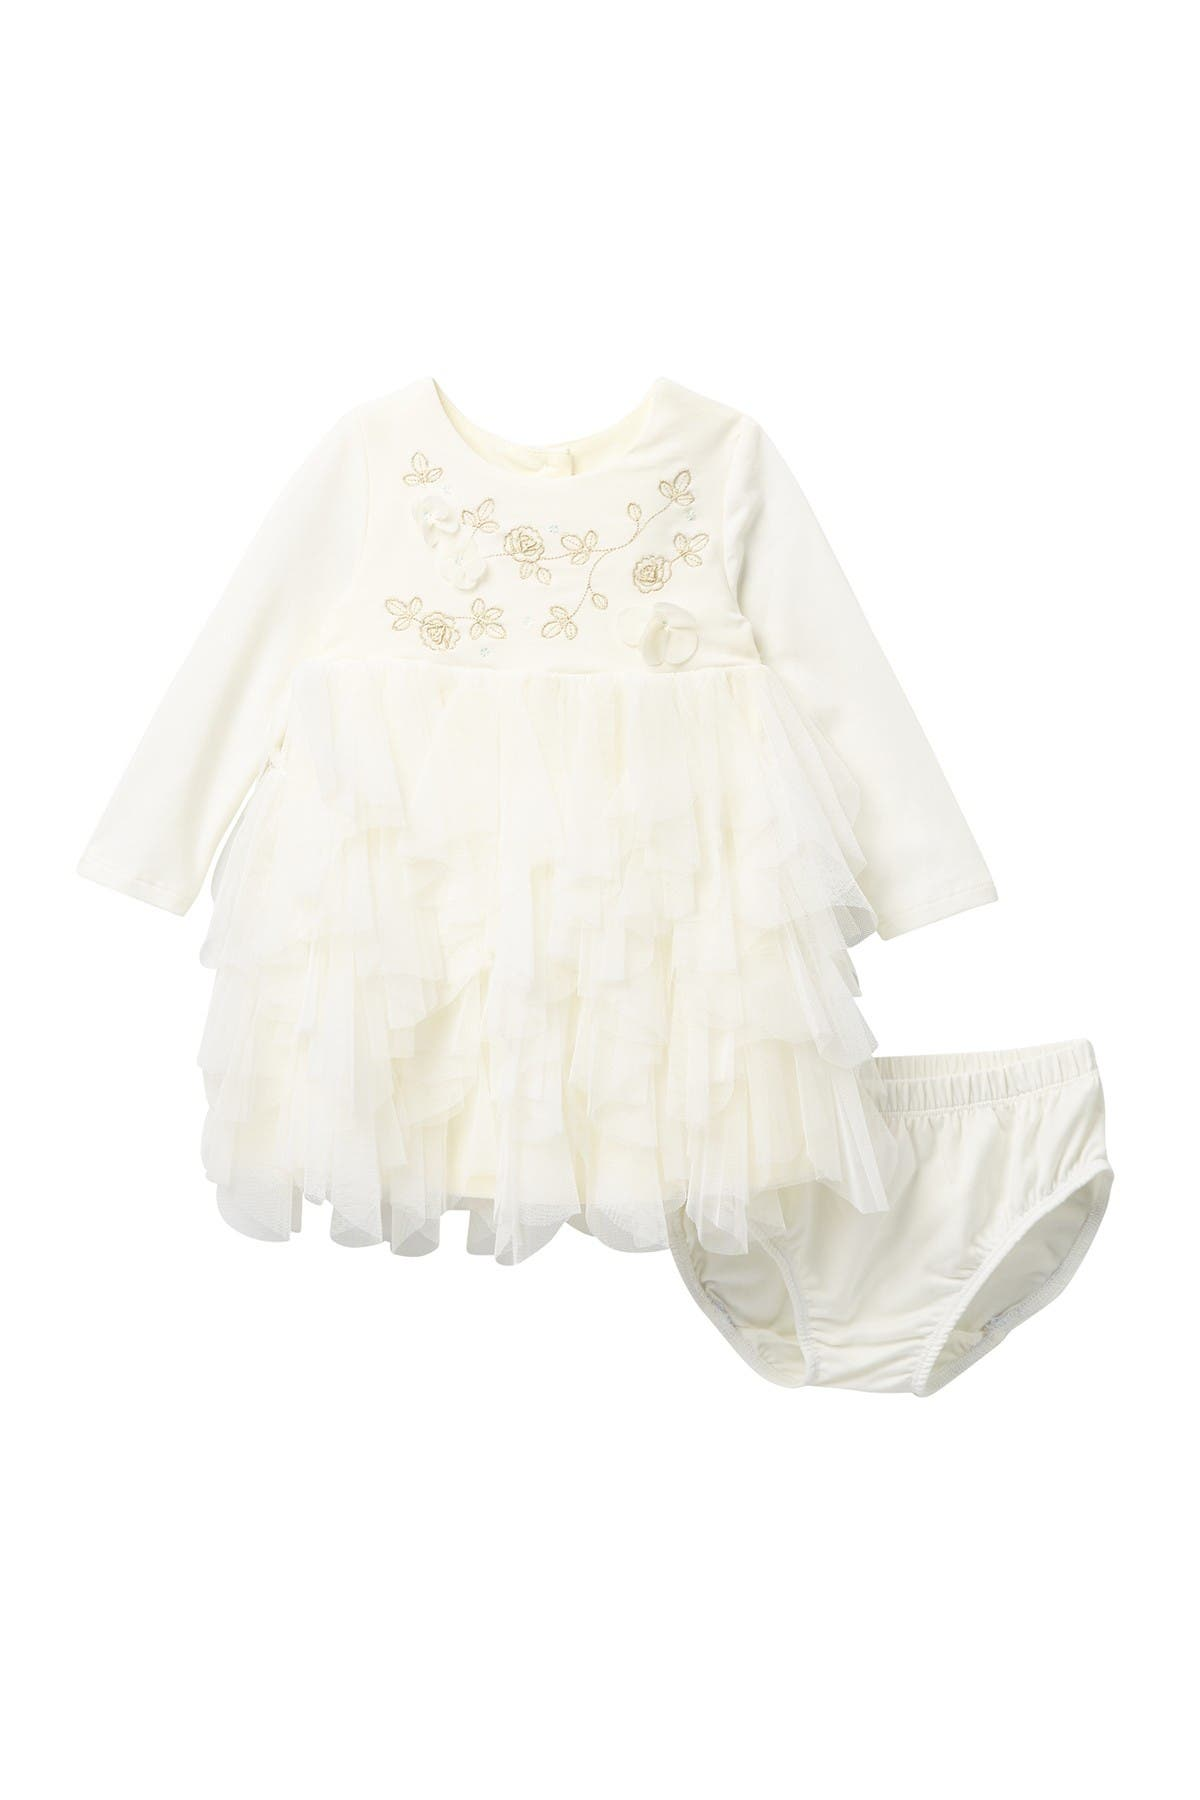 BISCOTTI Ruffled Dress Set